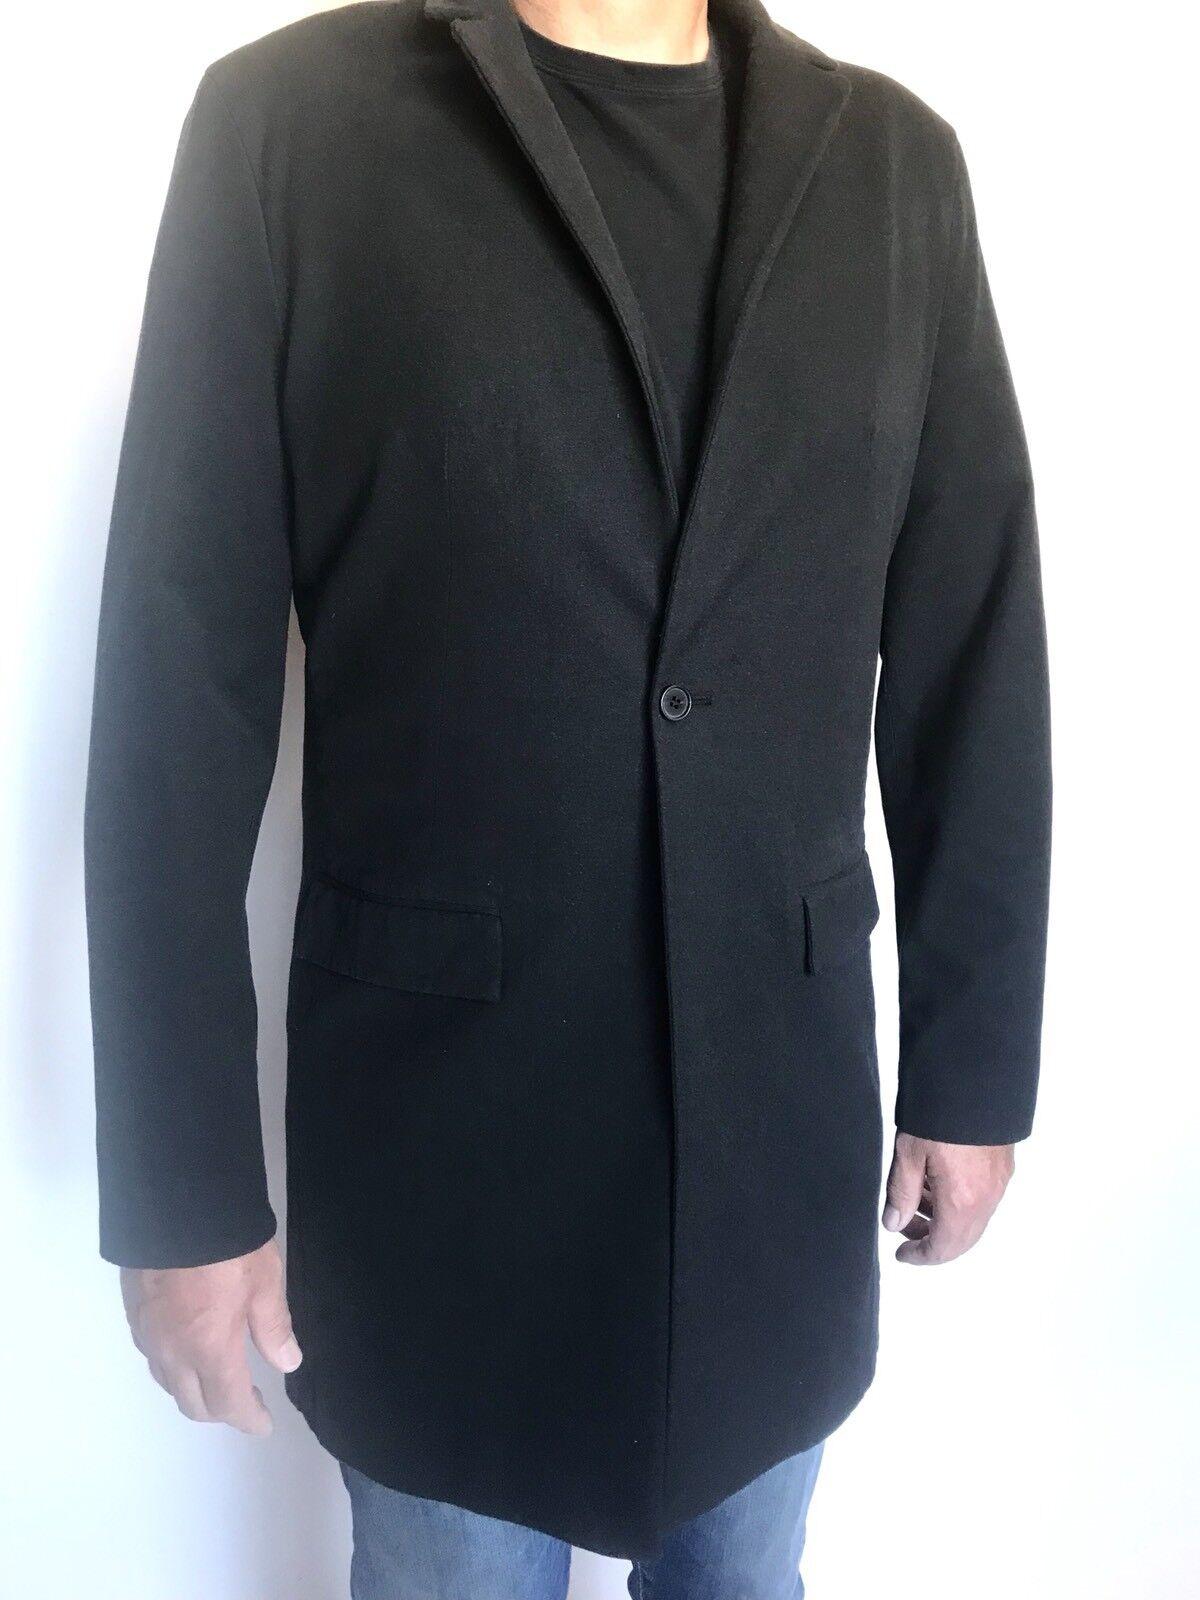 AllSaints Carti Coat. Charcoal Grau Retail 540 Price 220 36 S NWT